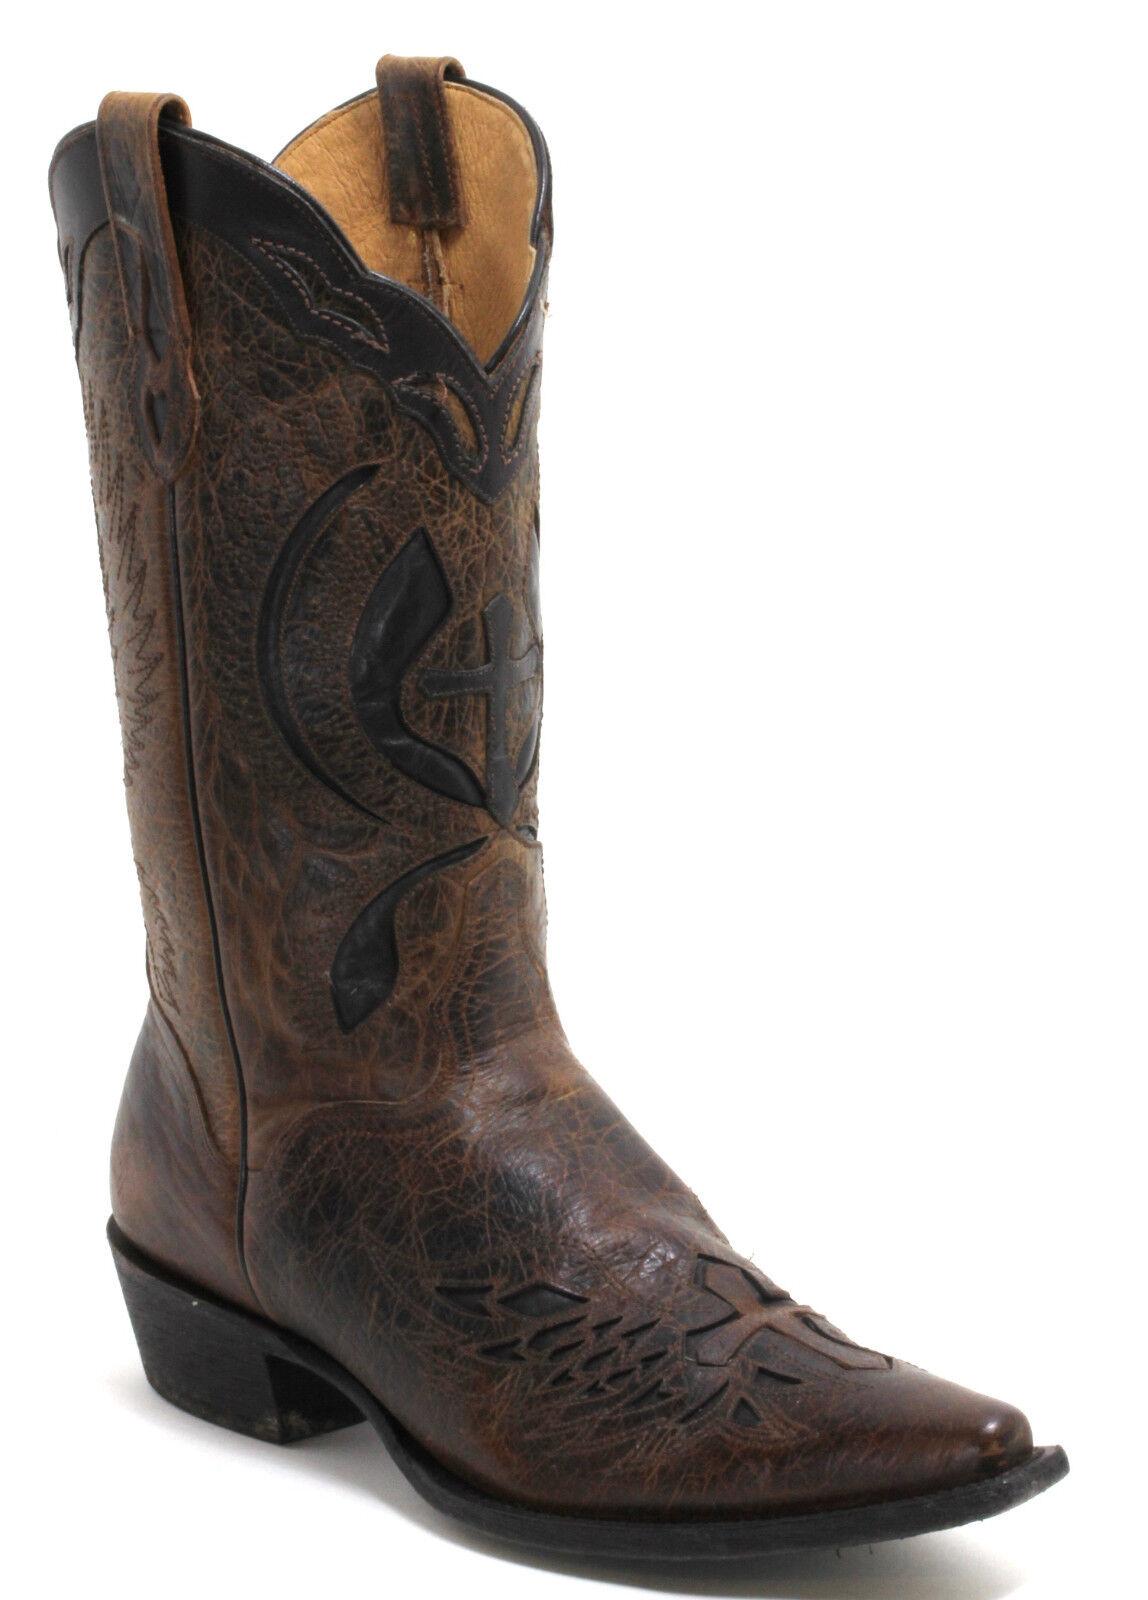 Westernstiefel Cowboystiefel Catalan J.B.Dillon Style Texas Line Dance J.B.Dillon Catalan 43,5 -44 228dac